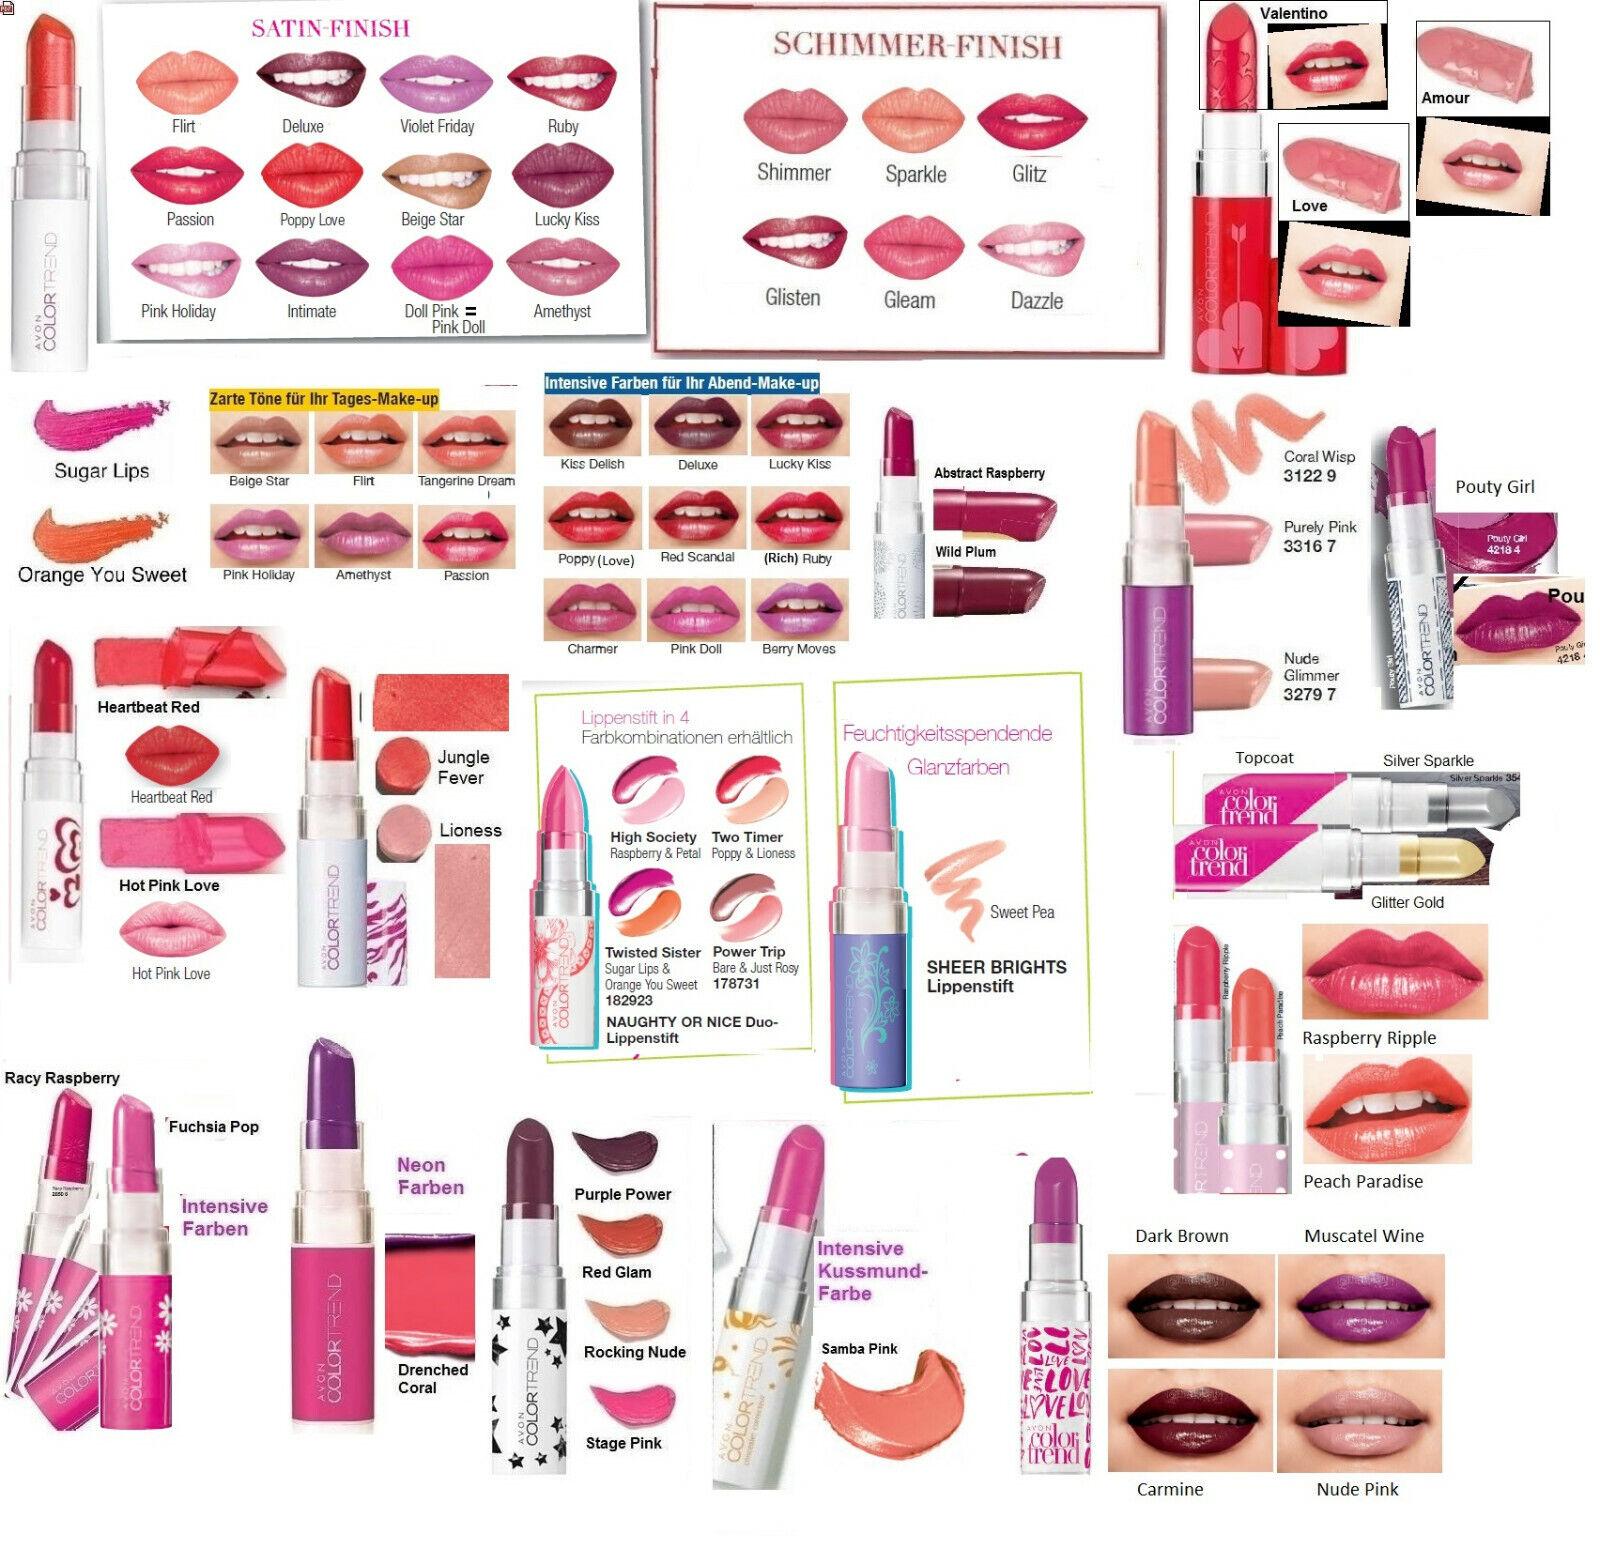 AVON Color Trend Kiss n Go Lippenstift 3,6g mit satter, cremiger Farbe